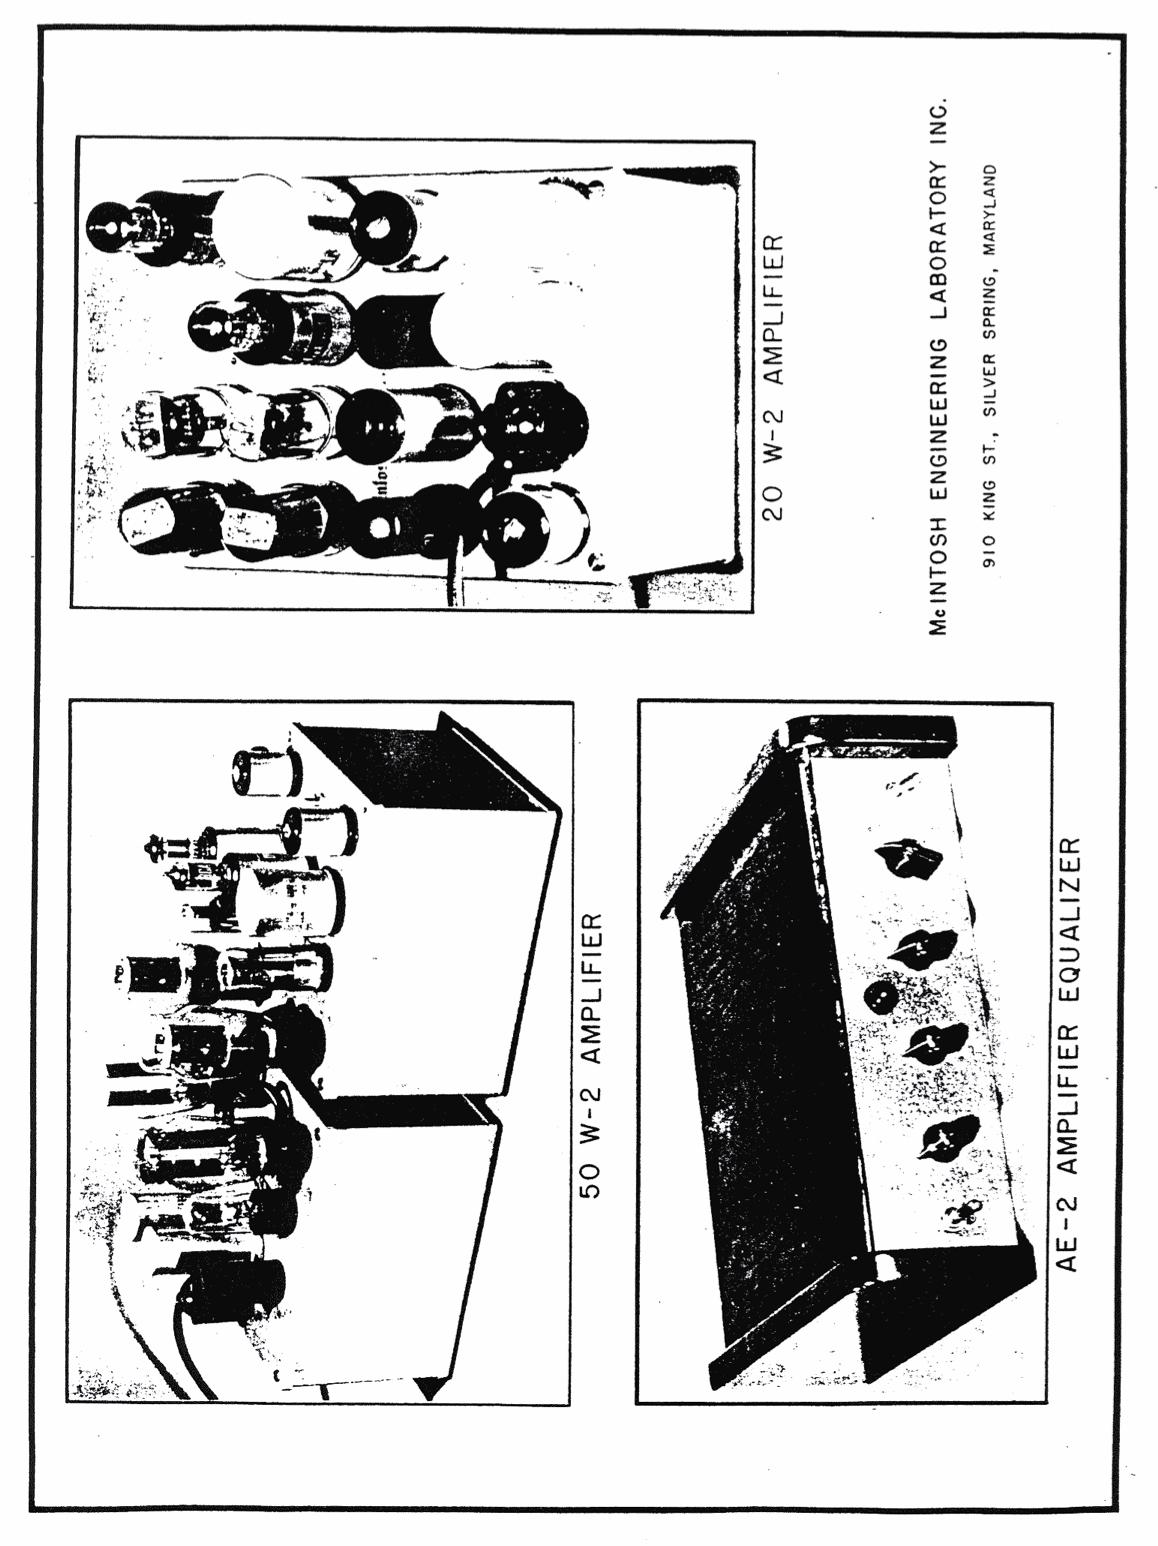 Retro Vintage Modern Hi Fi Mcintosh New 50 Watt Amplifier Circuit 1949 2 Description And Analysis Of A